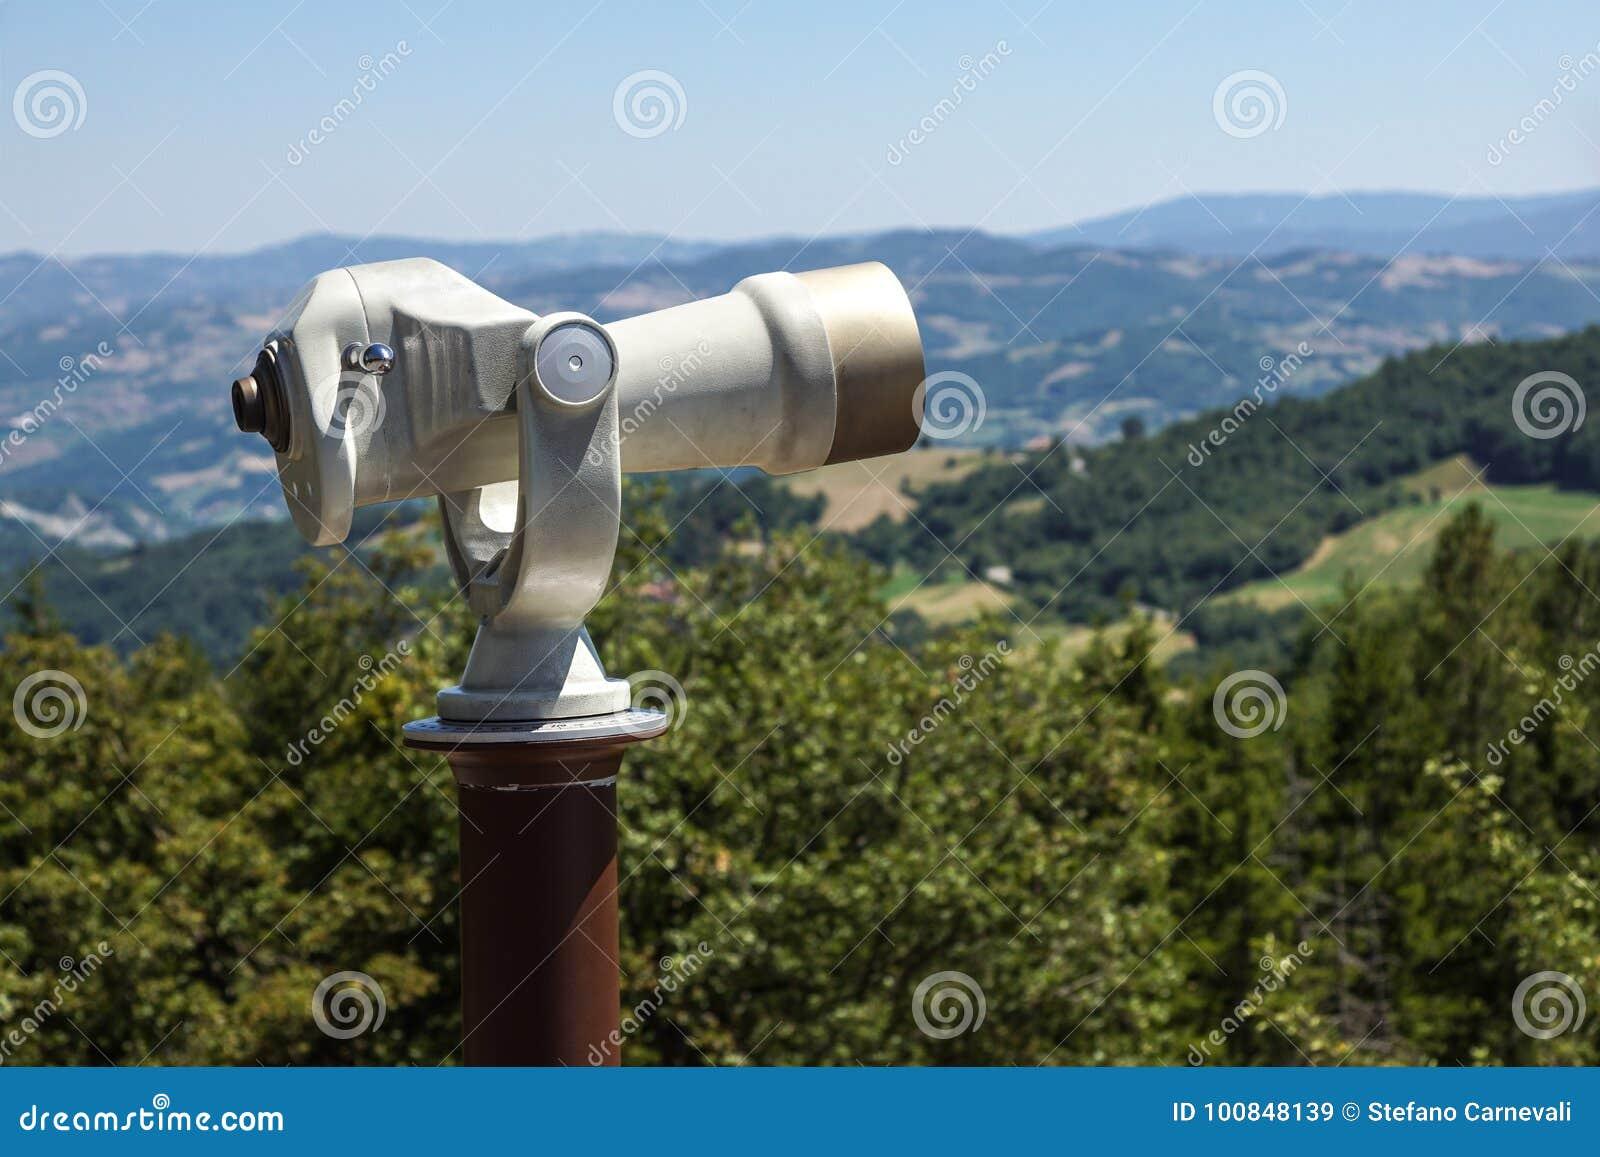 Fairytopia Tourist-telescope-landscape-exploring-tourist-telescope-landscape-exploring-mounting-100848139